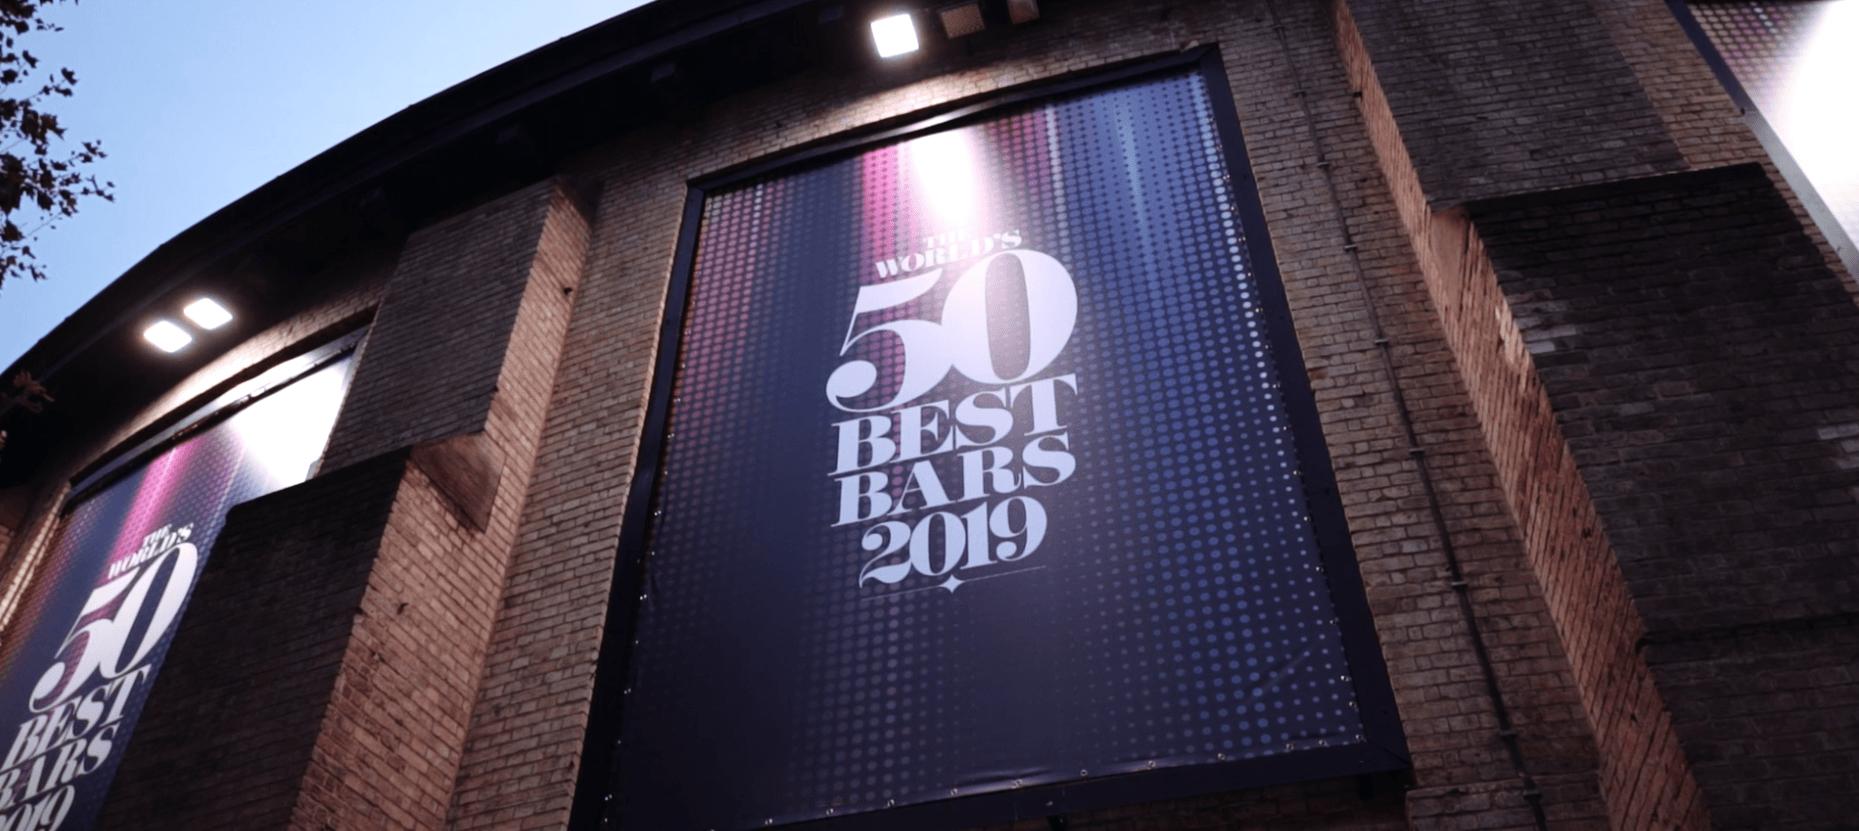 Thomas Henry bei den Worlds 50 Best Bars in London 2019